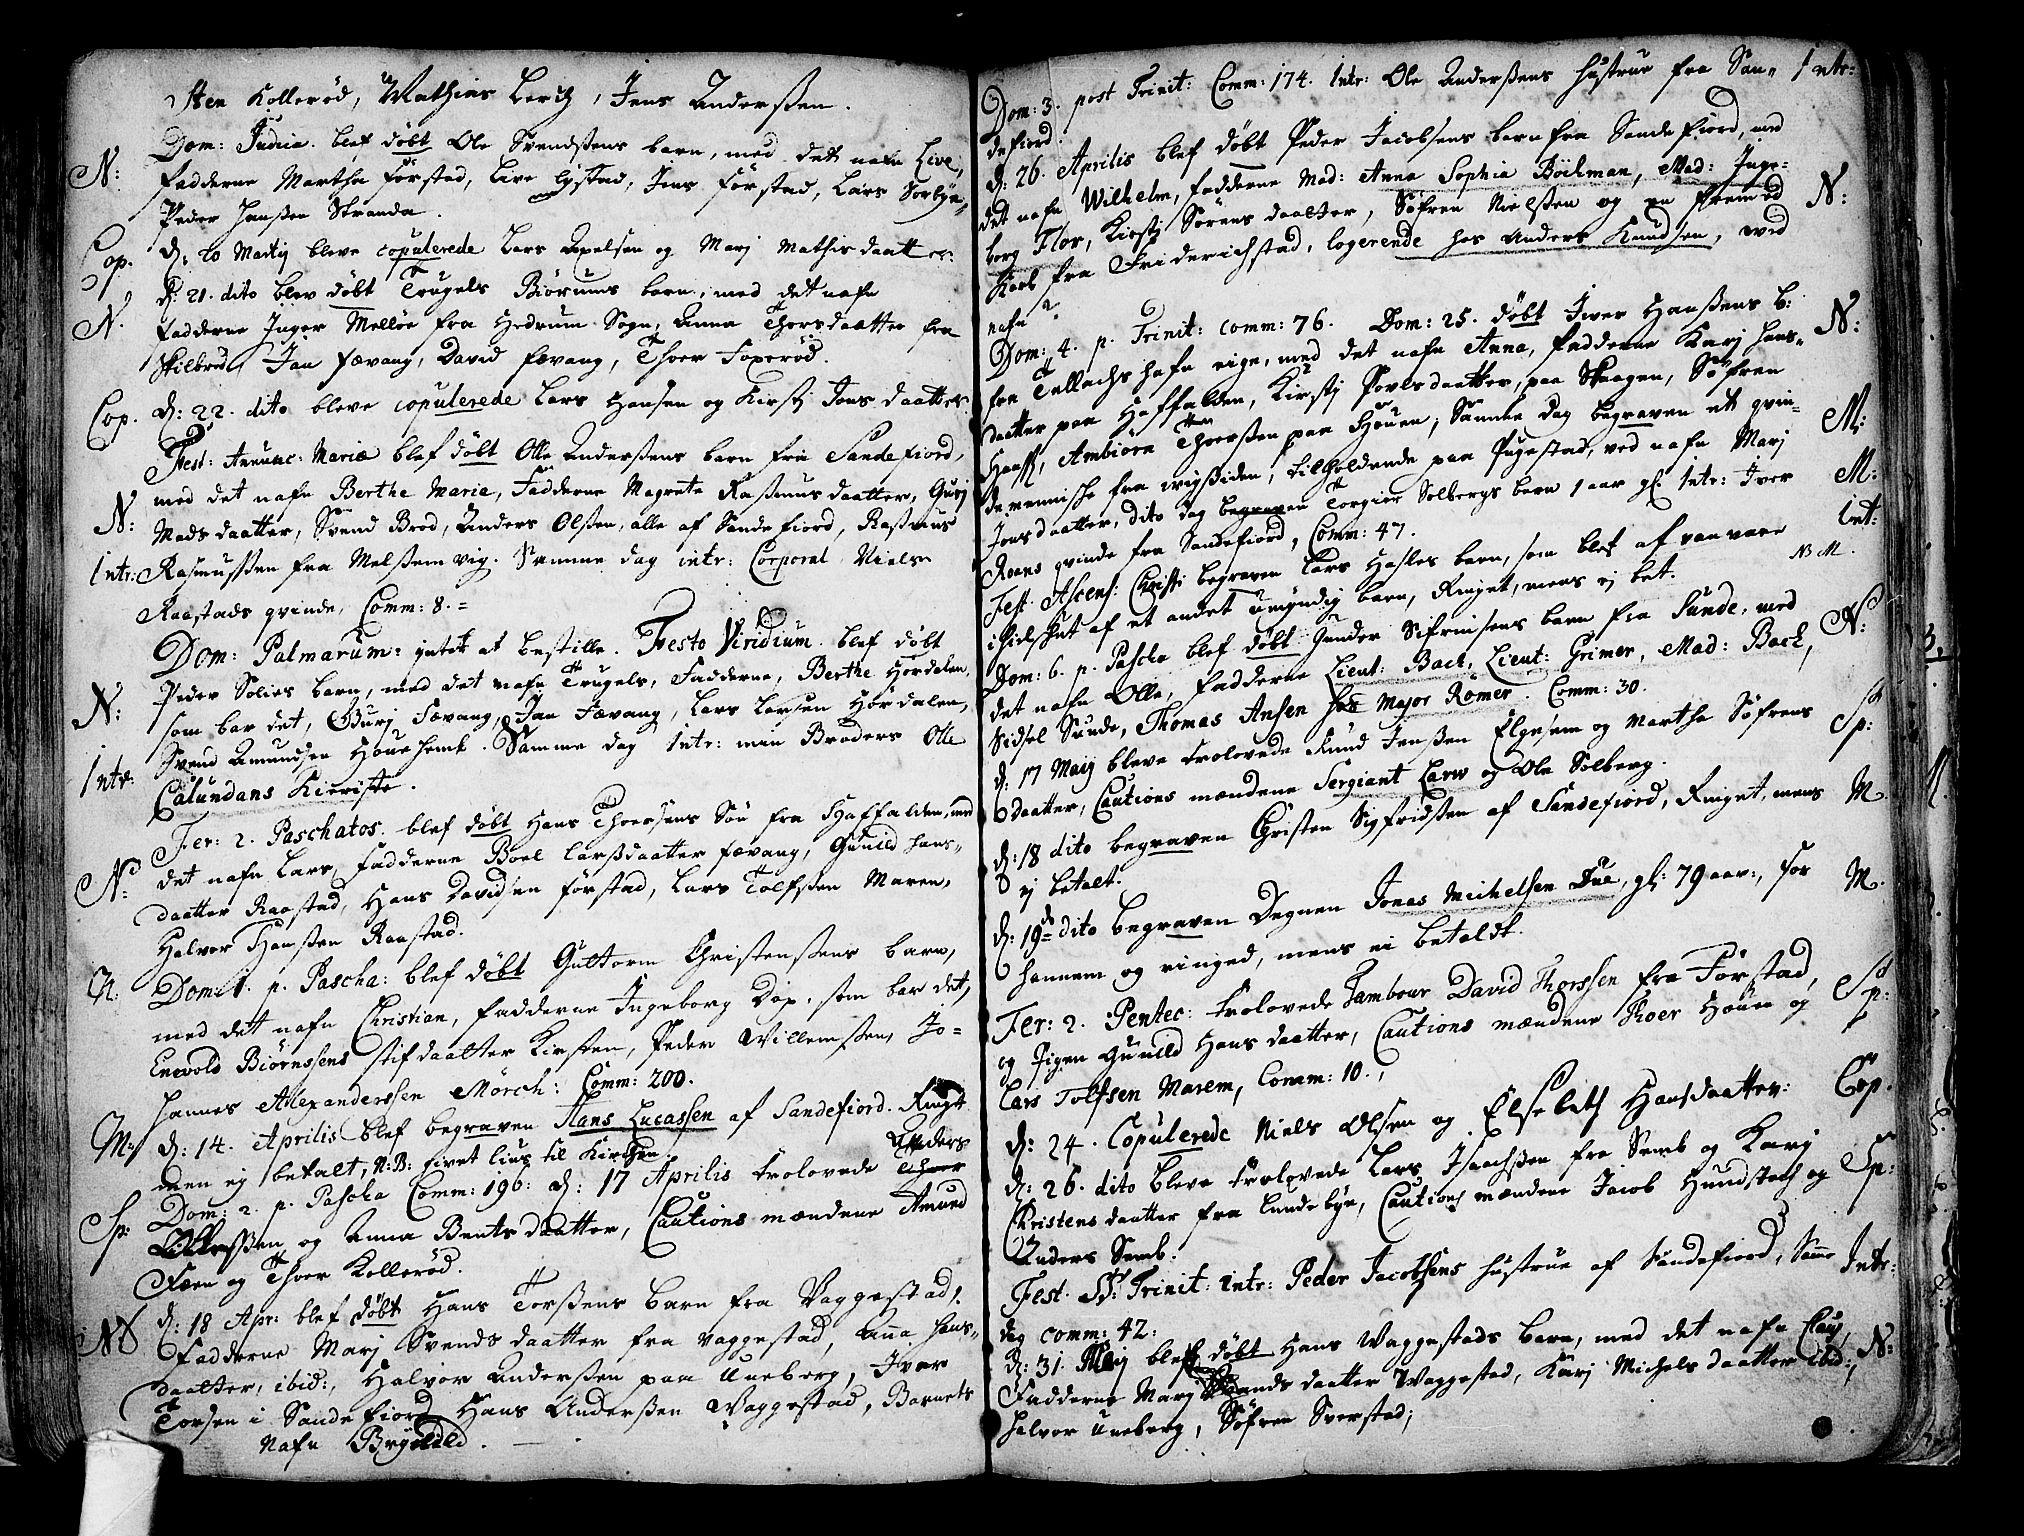 SAKO, Sandar kirkebøker, F/Fa/L0001: Ministerialbok nr. 1, 1709-1733